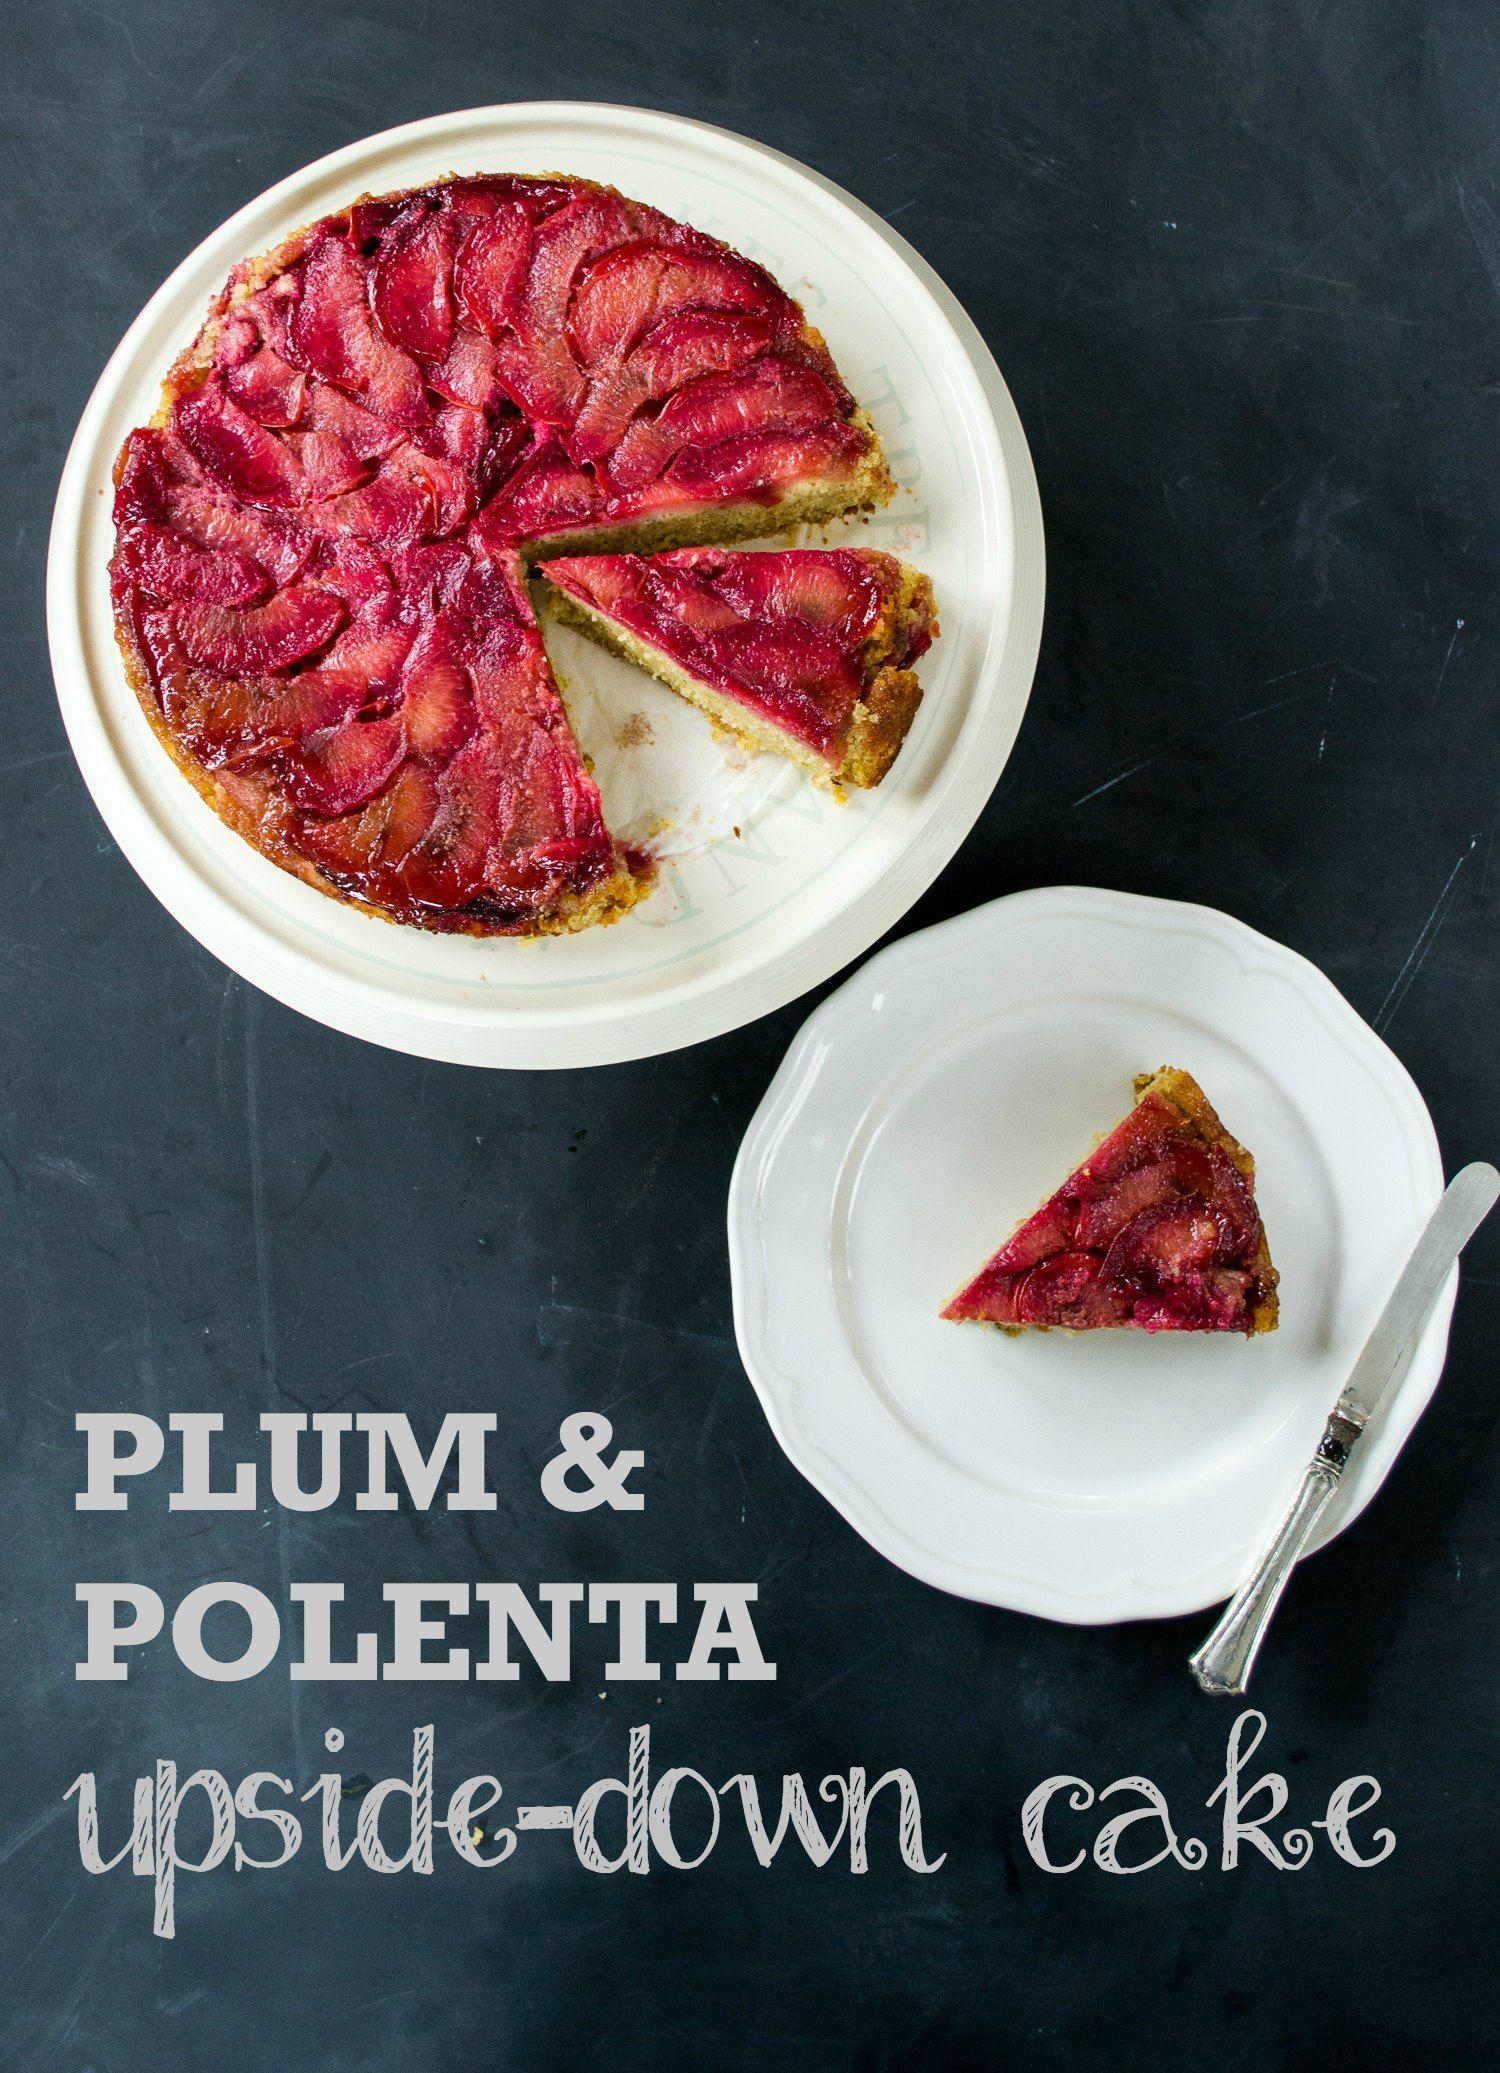 Recipe Plum Polenta Upside Down Cake Vegan The Veg Space Plum Recipes Polenta Cakes Recipes